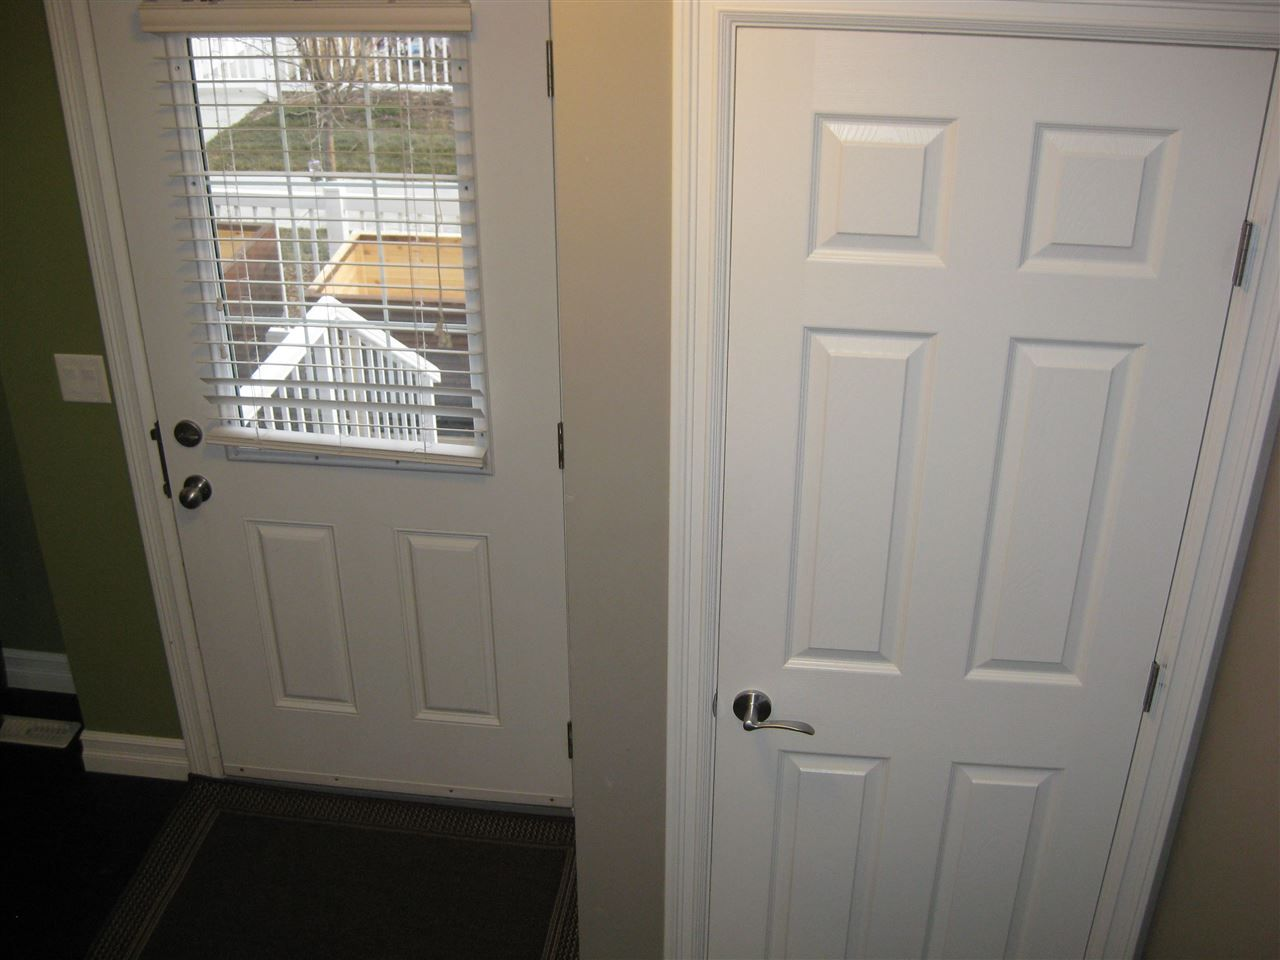 Photo 4: Photos: #41 3625 144 AV NW in Edmonton: Zone 35 Townhouse for sale : MLS®# E4016087